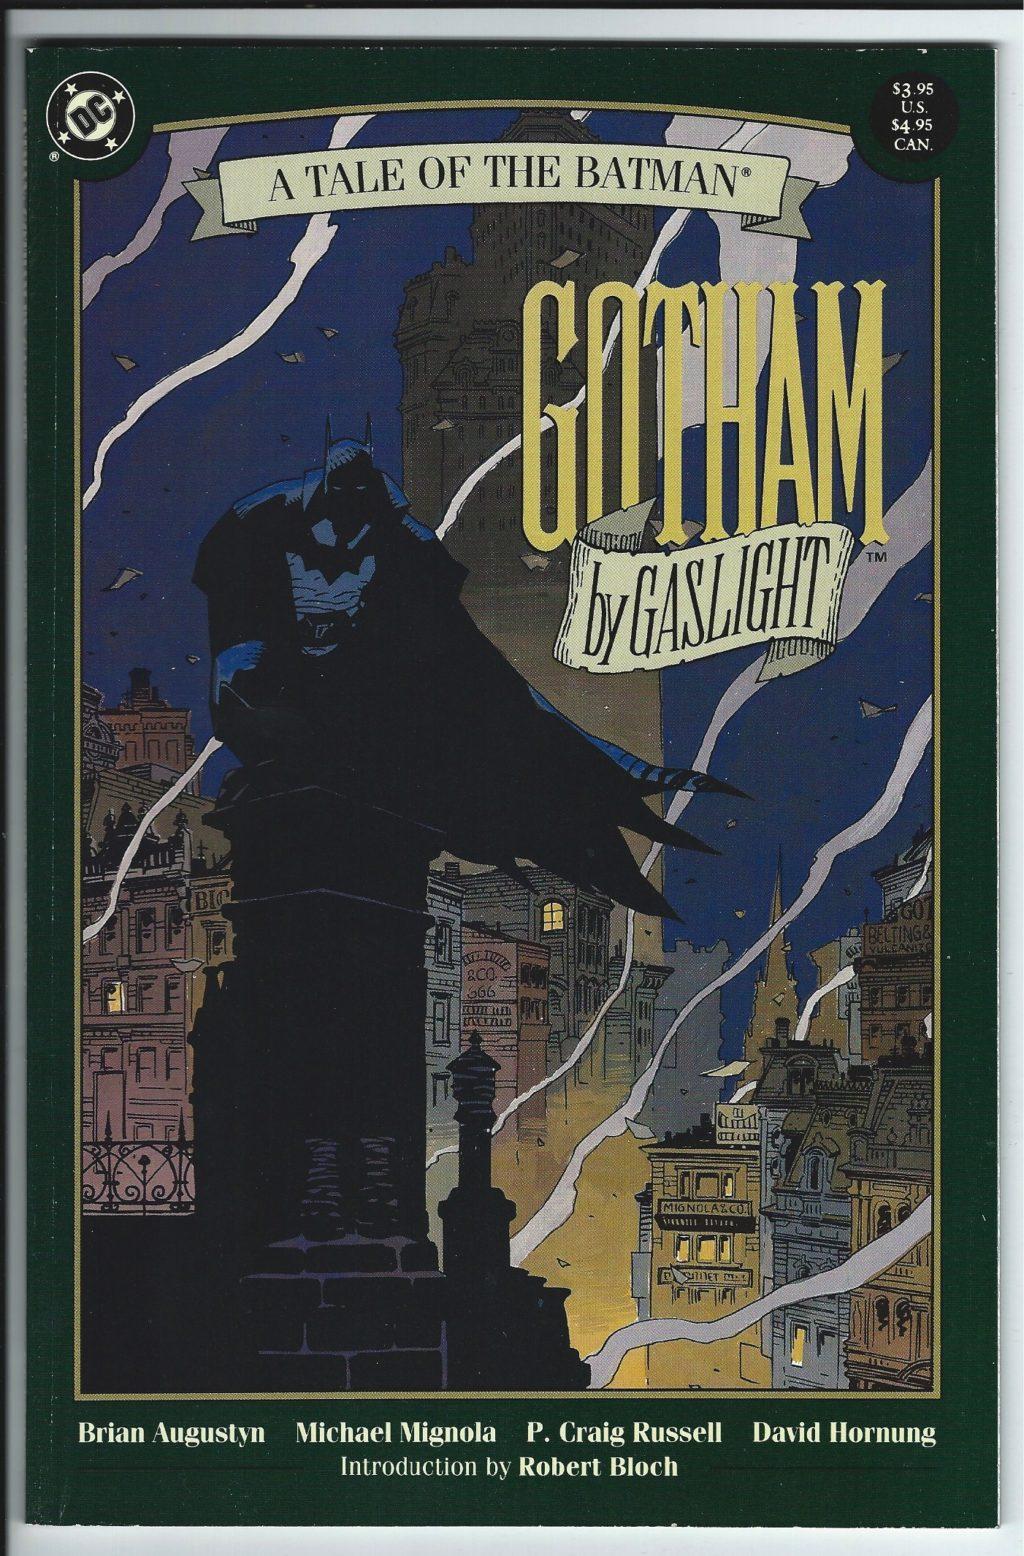 gotham by gaslight